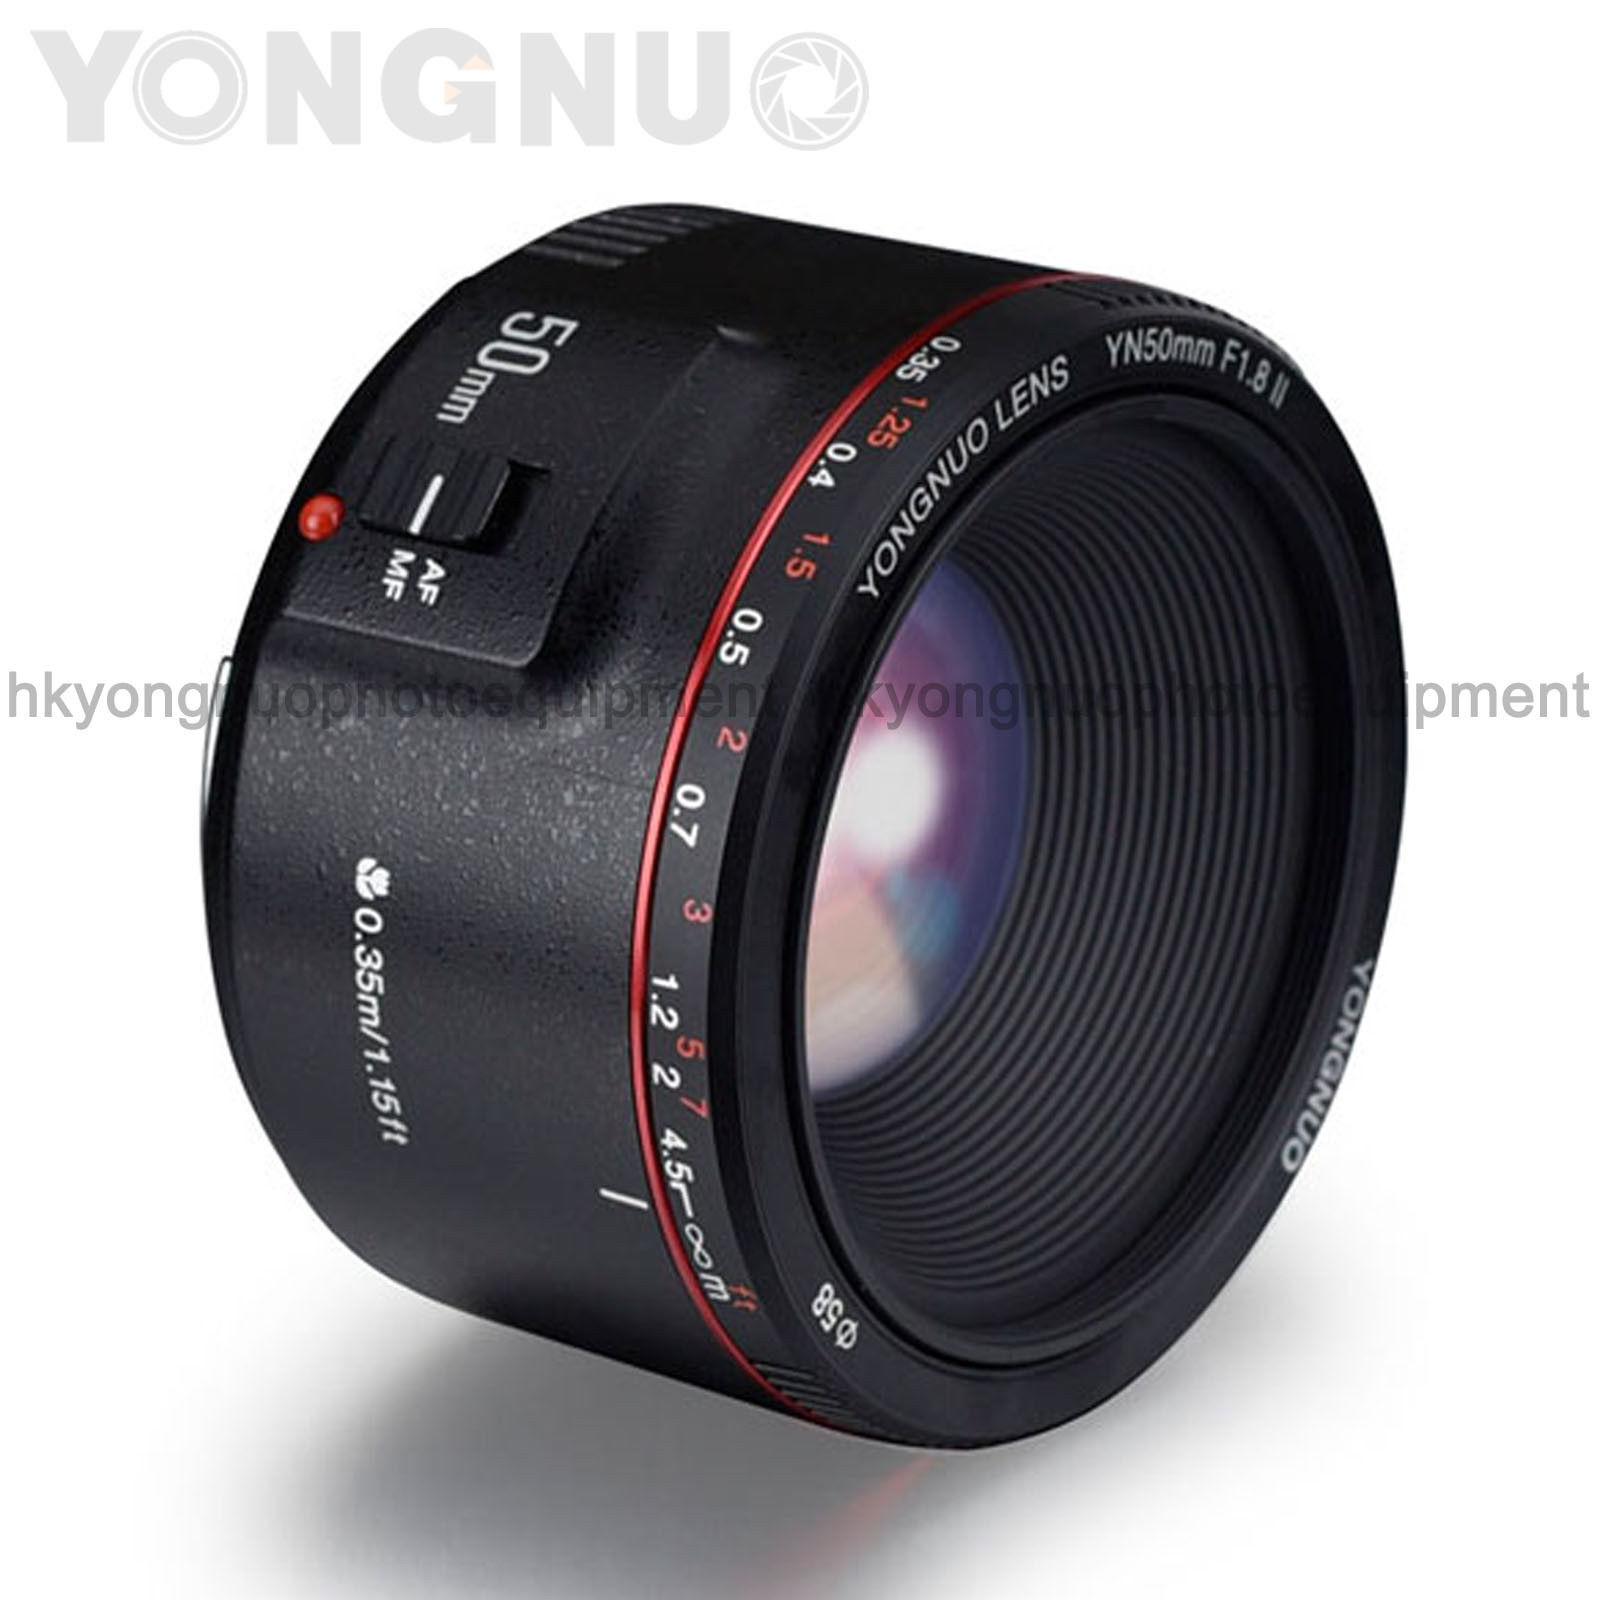 Yongnuo YN50MM F1.8 F1.4 Prime Standard Lens AFMF for Canon Nikon DSLR Camera